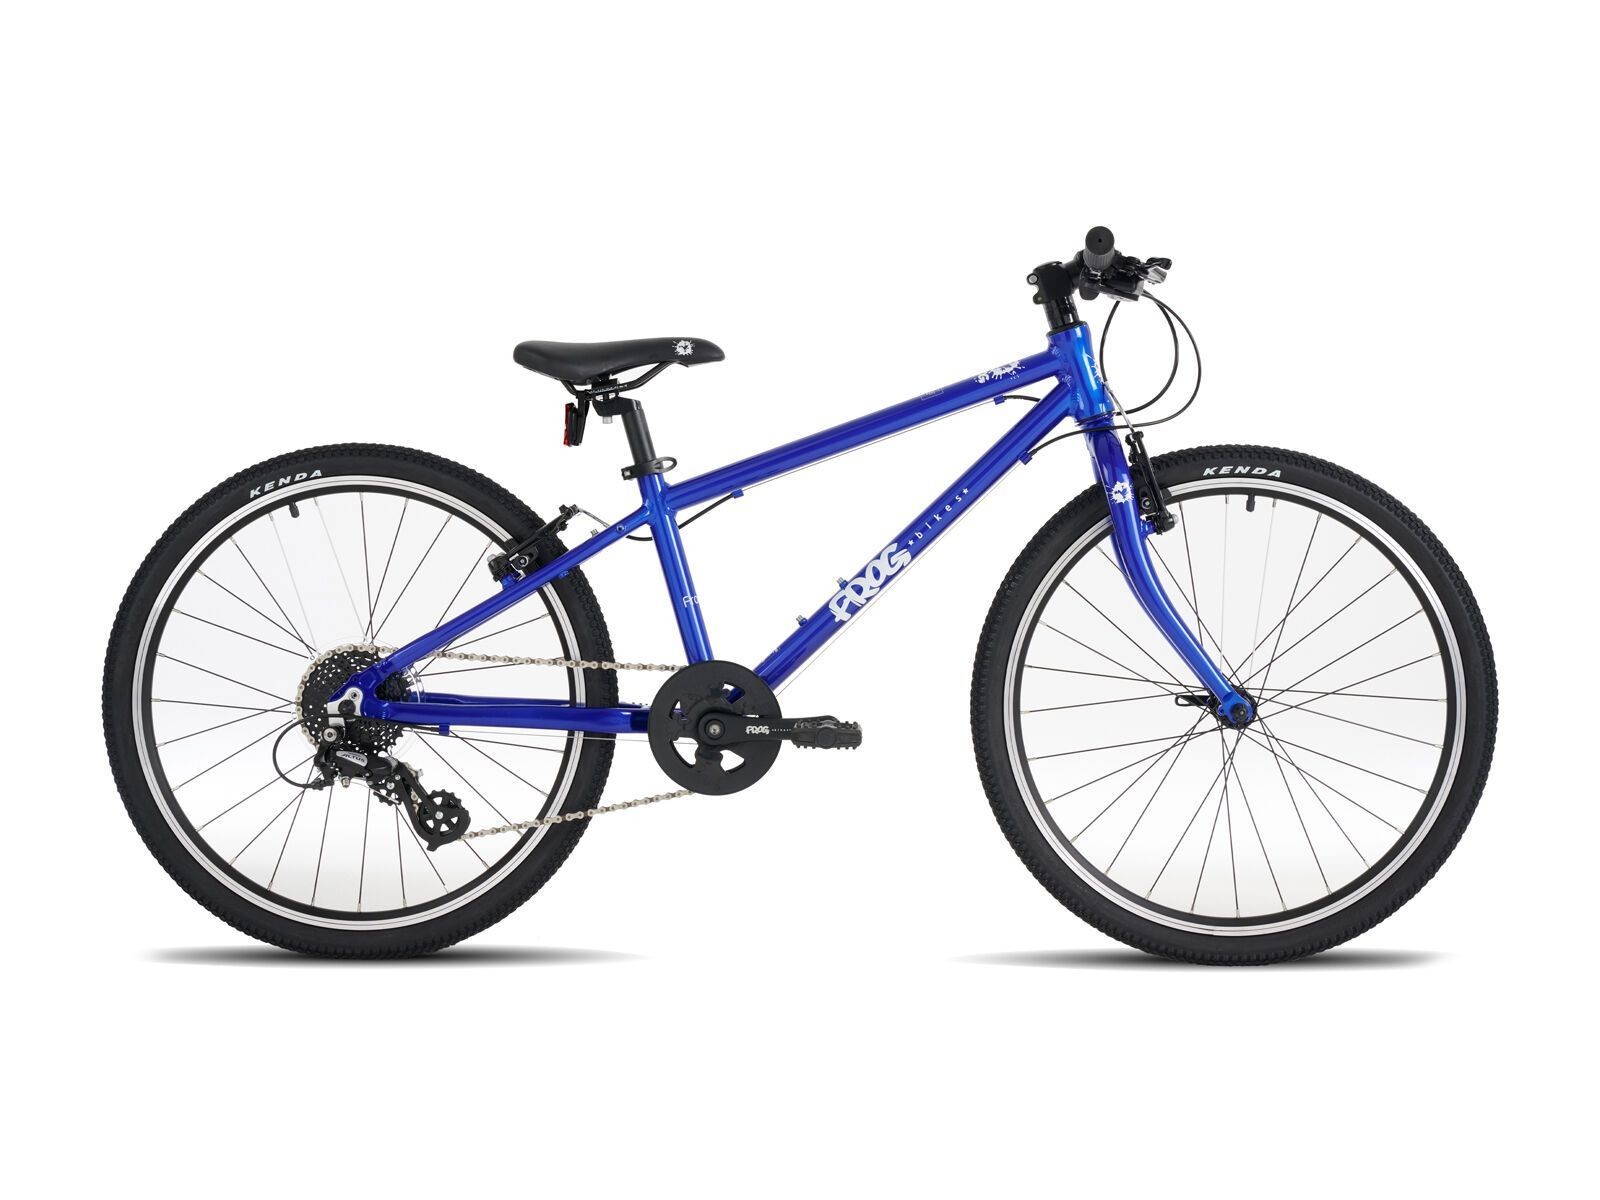 Frog Bikes Frog 62 electric blue 2021 30.5 cm L-FH62-EBL